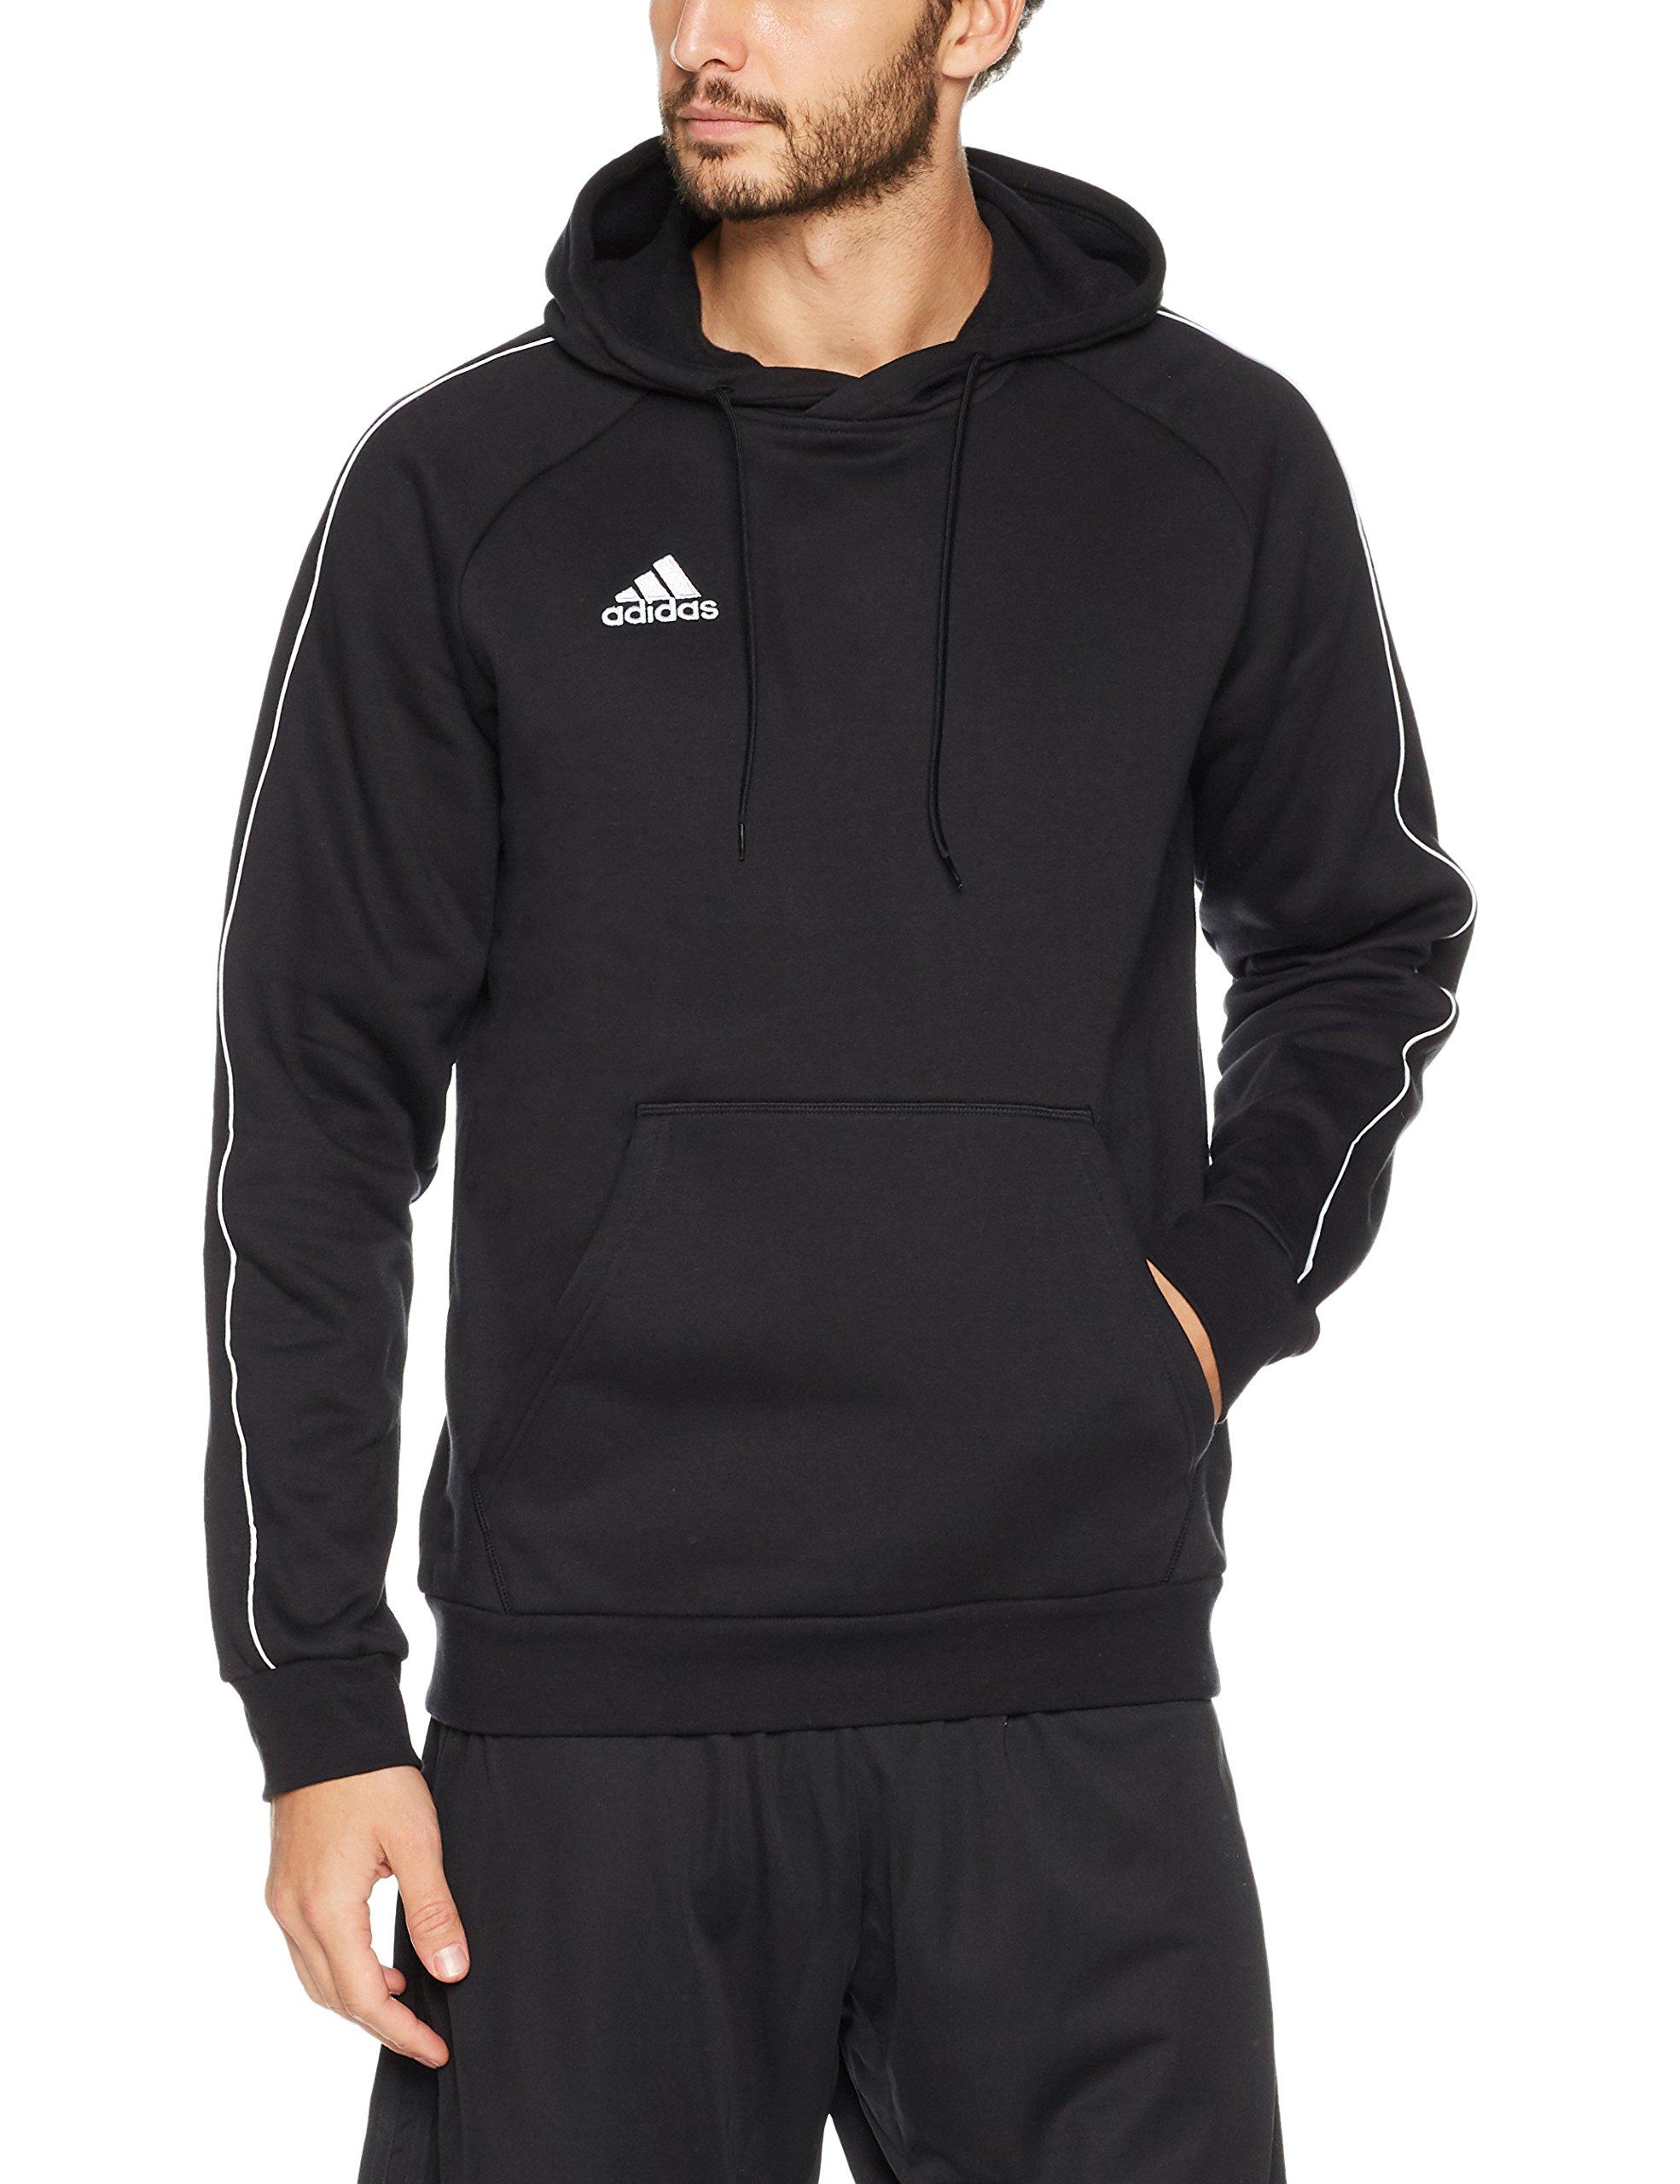 60b7da56c4f7 adidas Football App Generic, Hooded Sweat Uomo, Black/White, M product image